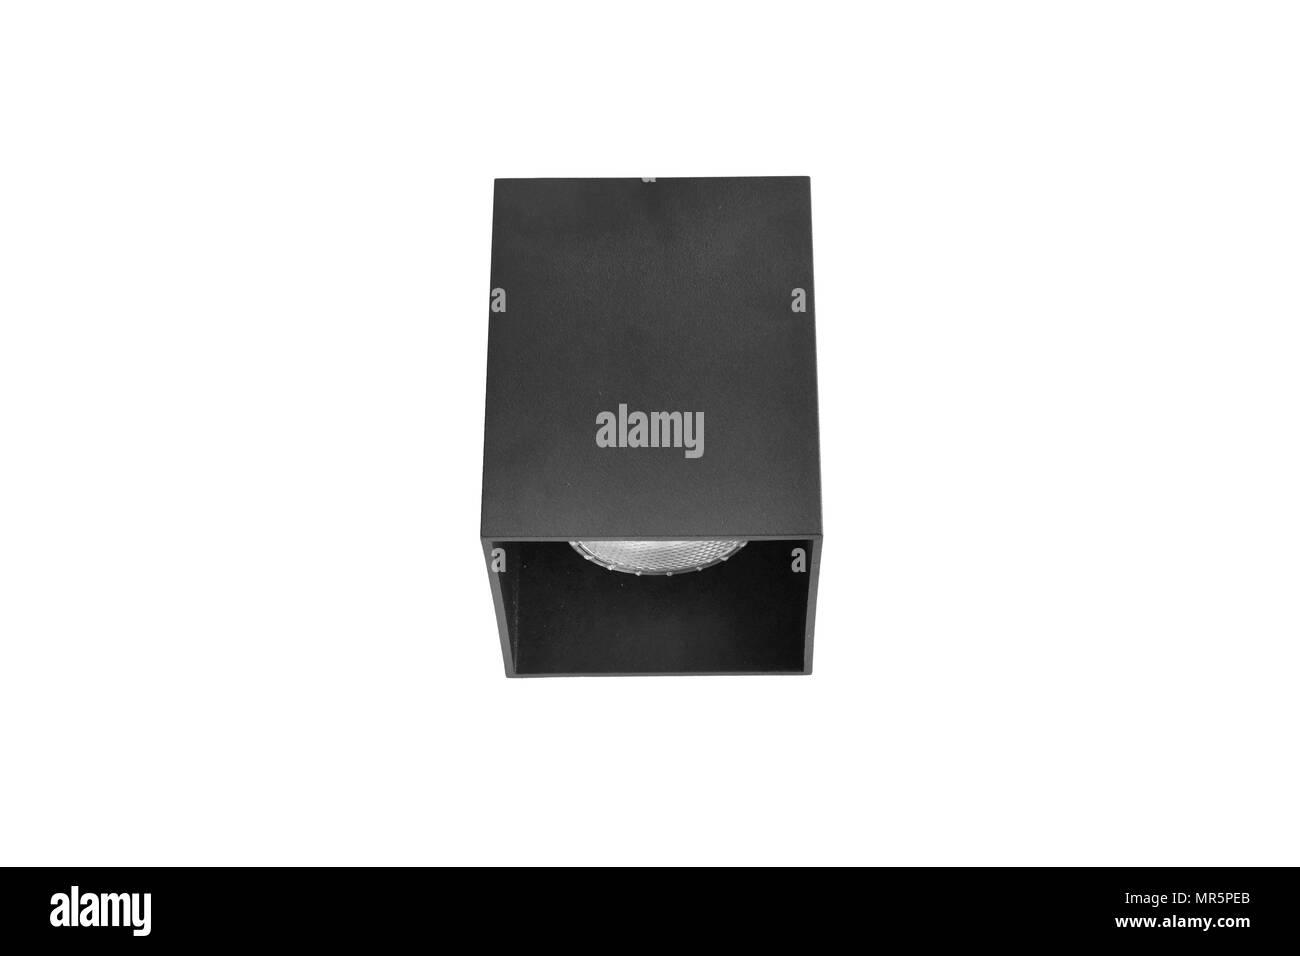 Black downlight or Ceiling light on white background - Stock Image